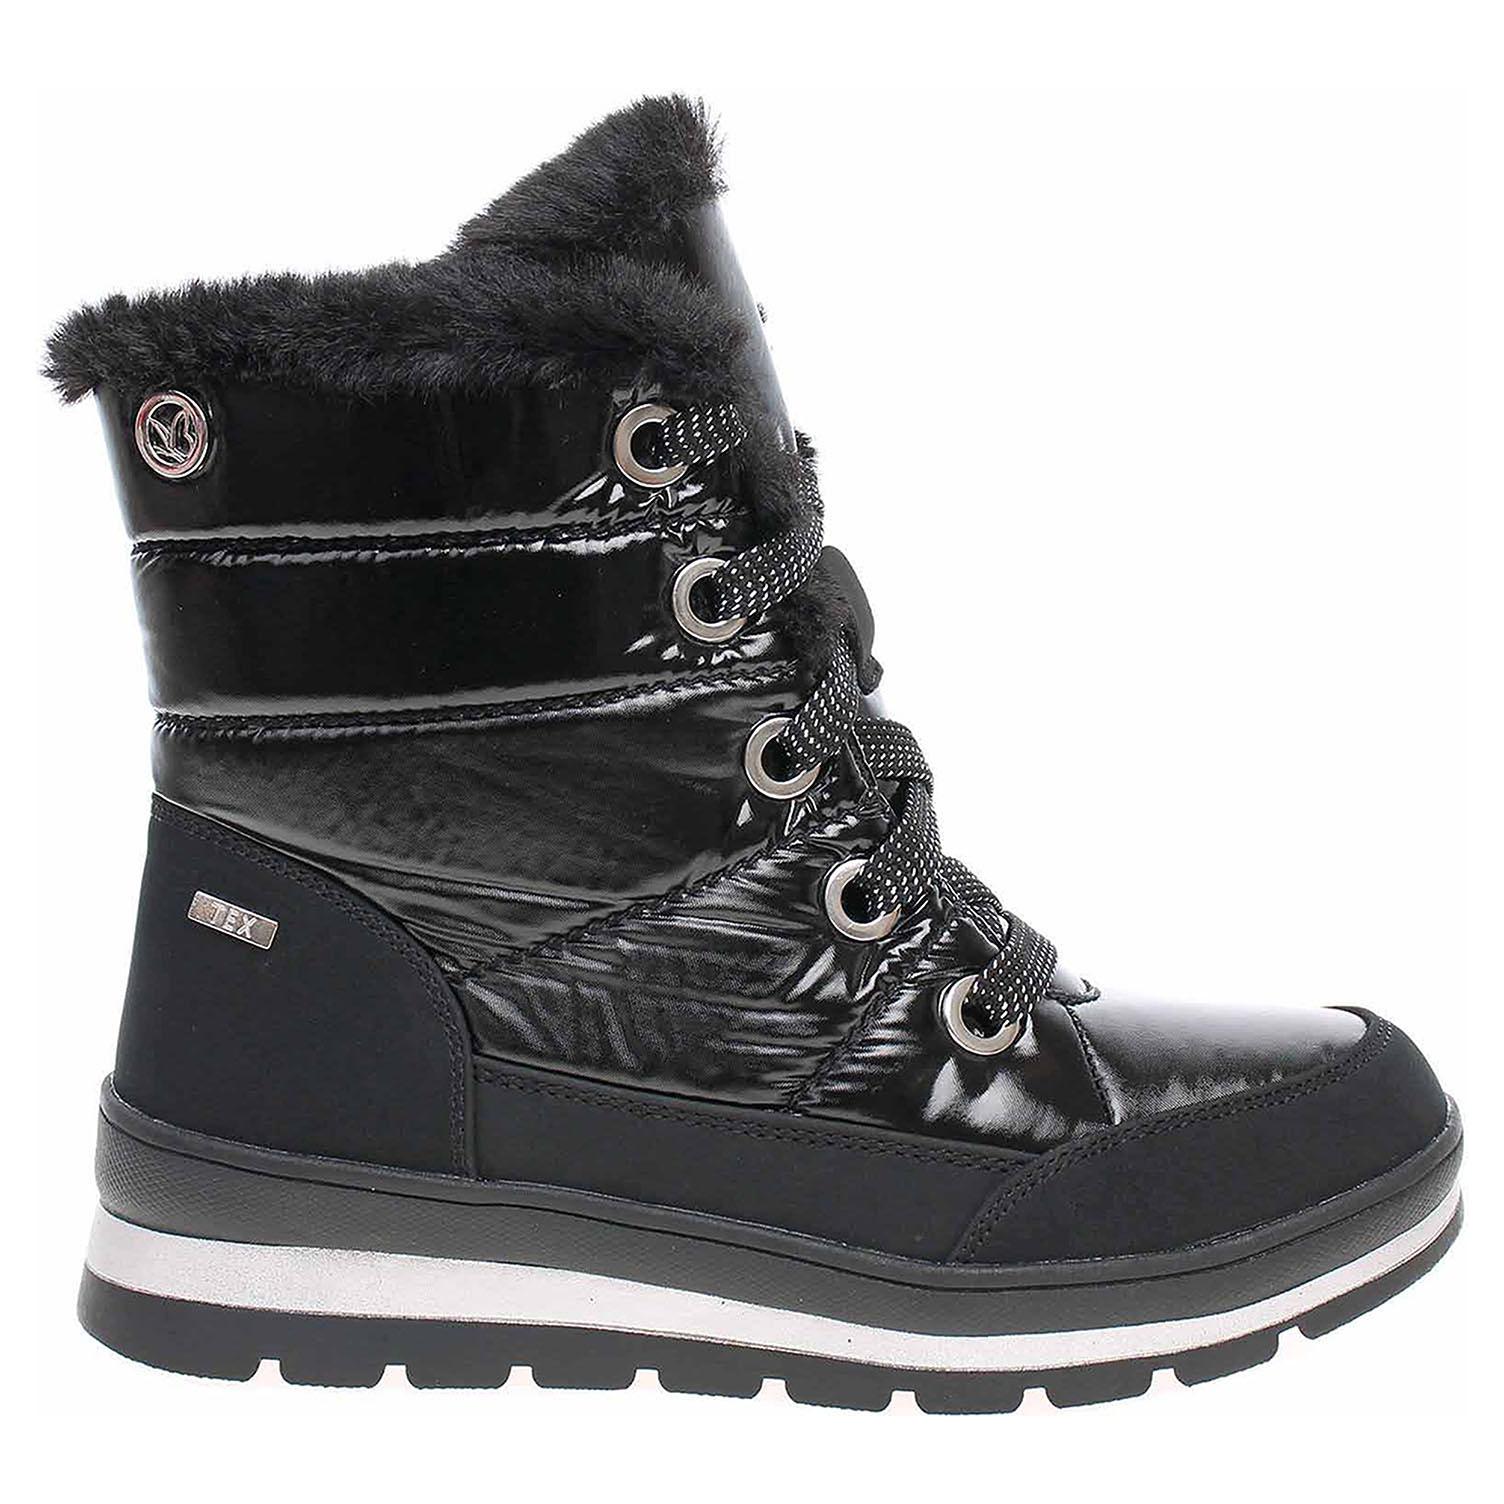 Ecco Caprice dámská obuv 9-26221-21 black comb 22400745 ff00fc1185e